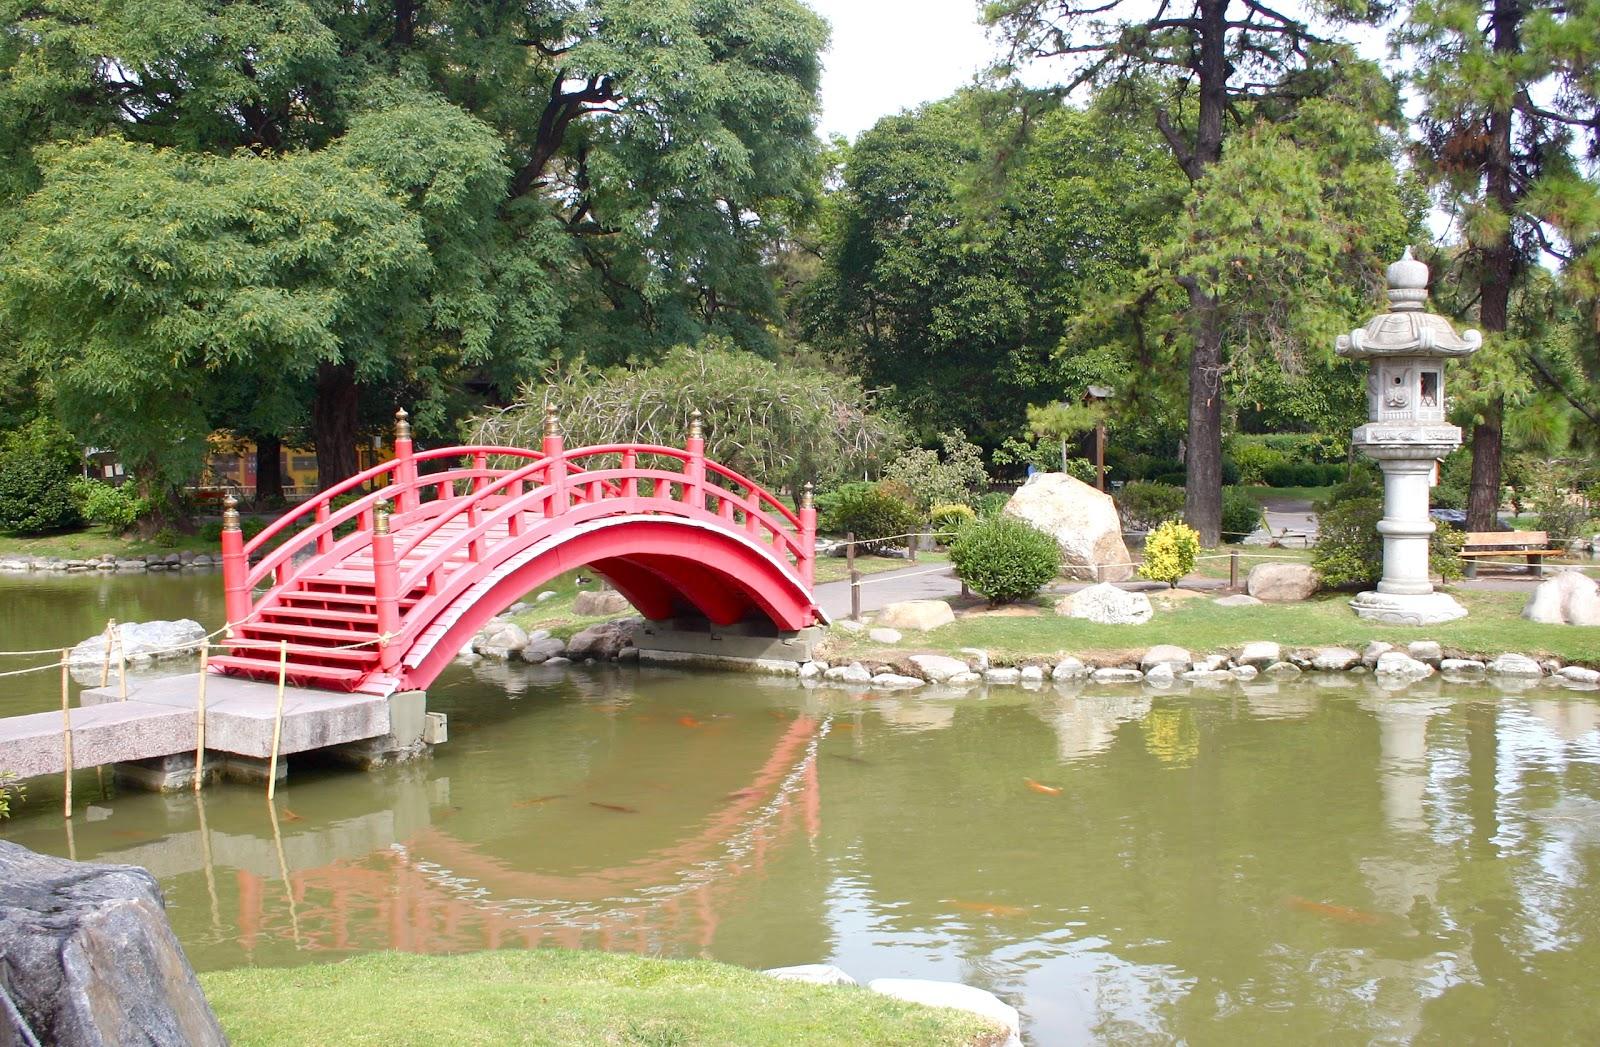 Kokoro la magia del giardino l 39 entrata for Jardin japones en casa